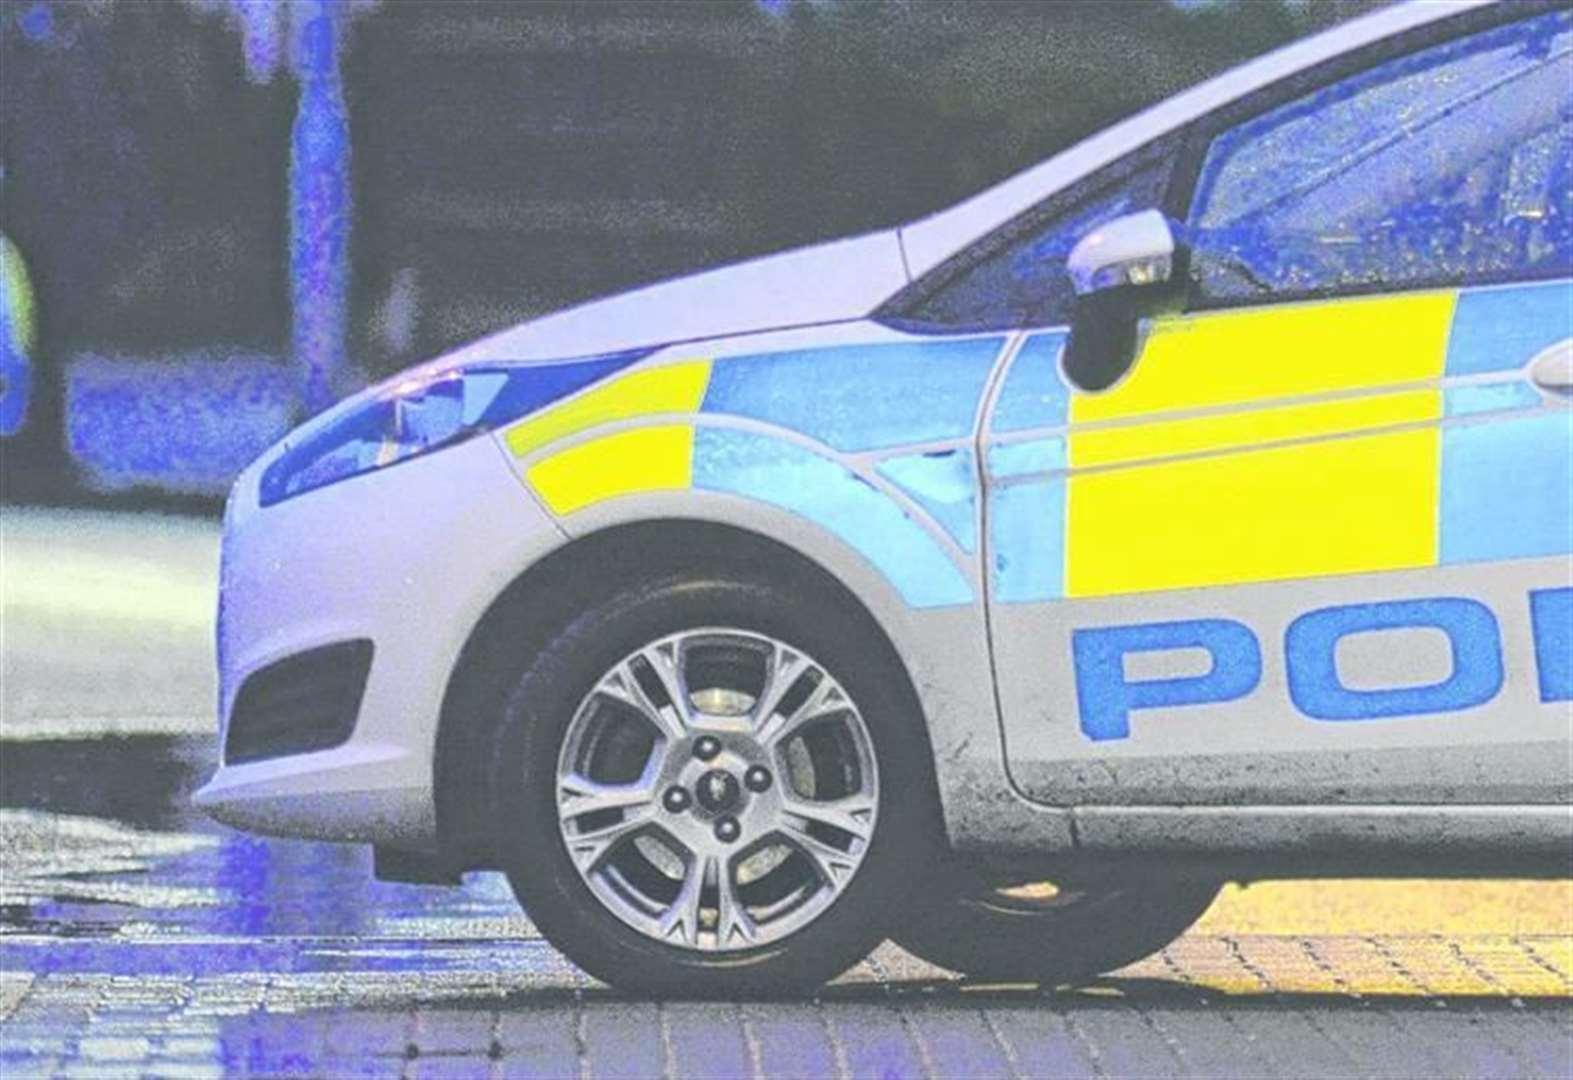 Police descend on Craylands Square, Swanscombe, to arrest